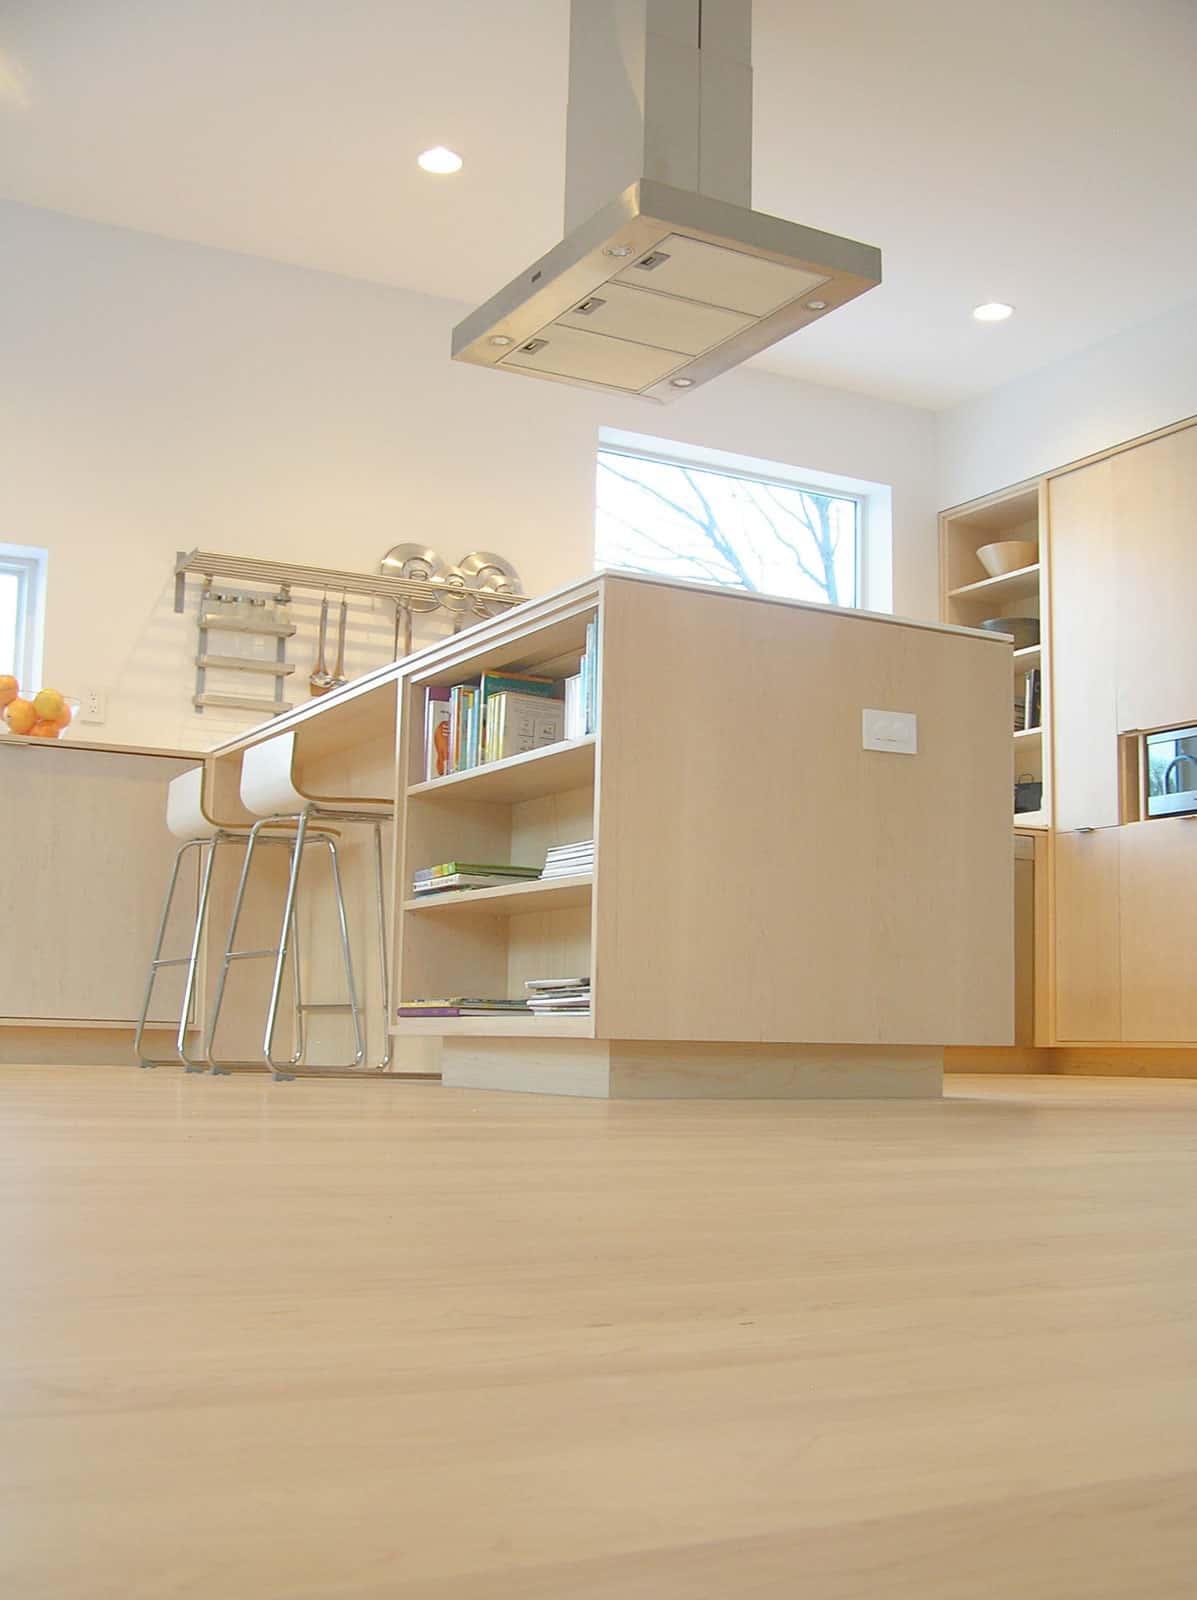 H4 Efficient Home Prototype by BRIO54